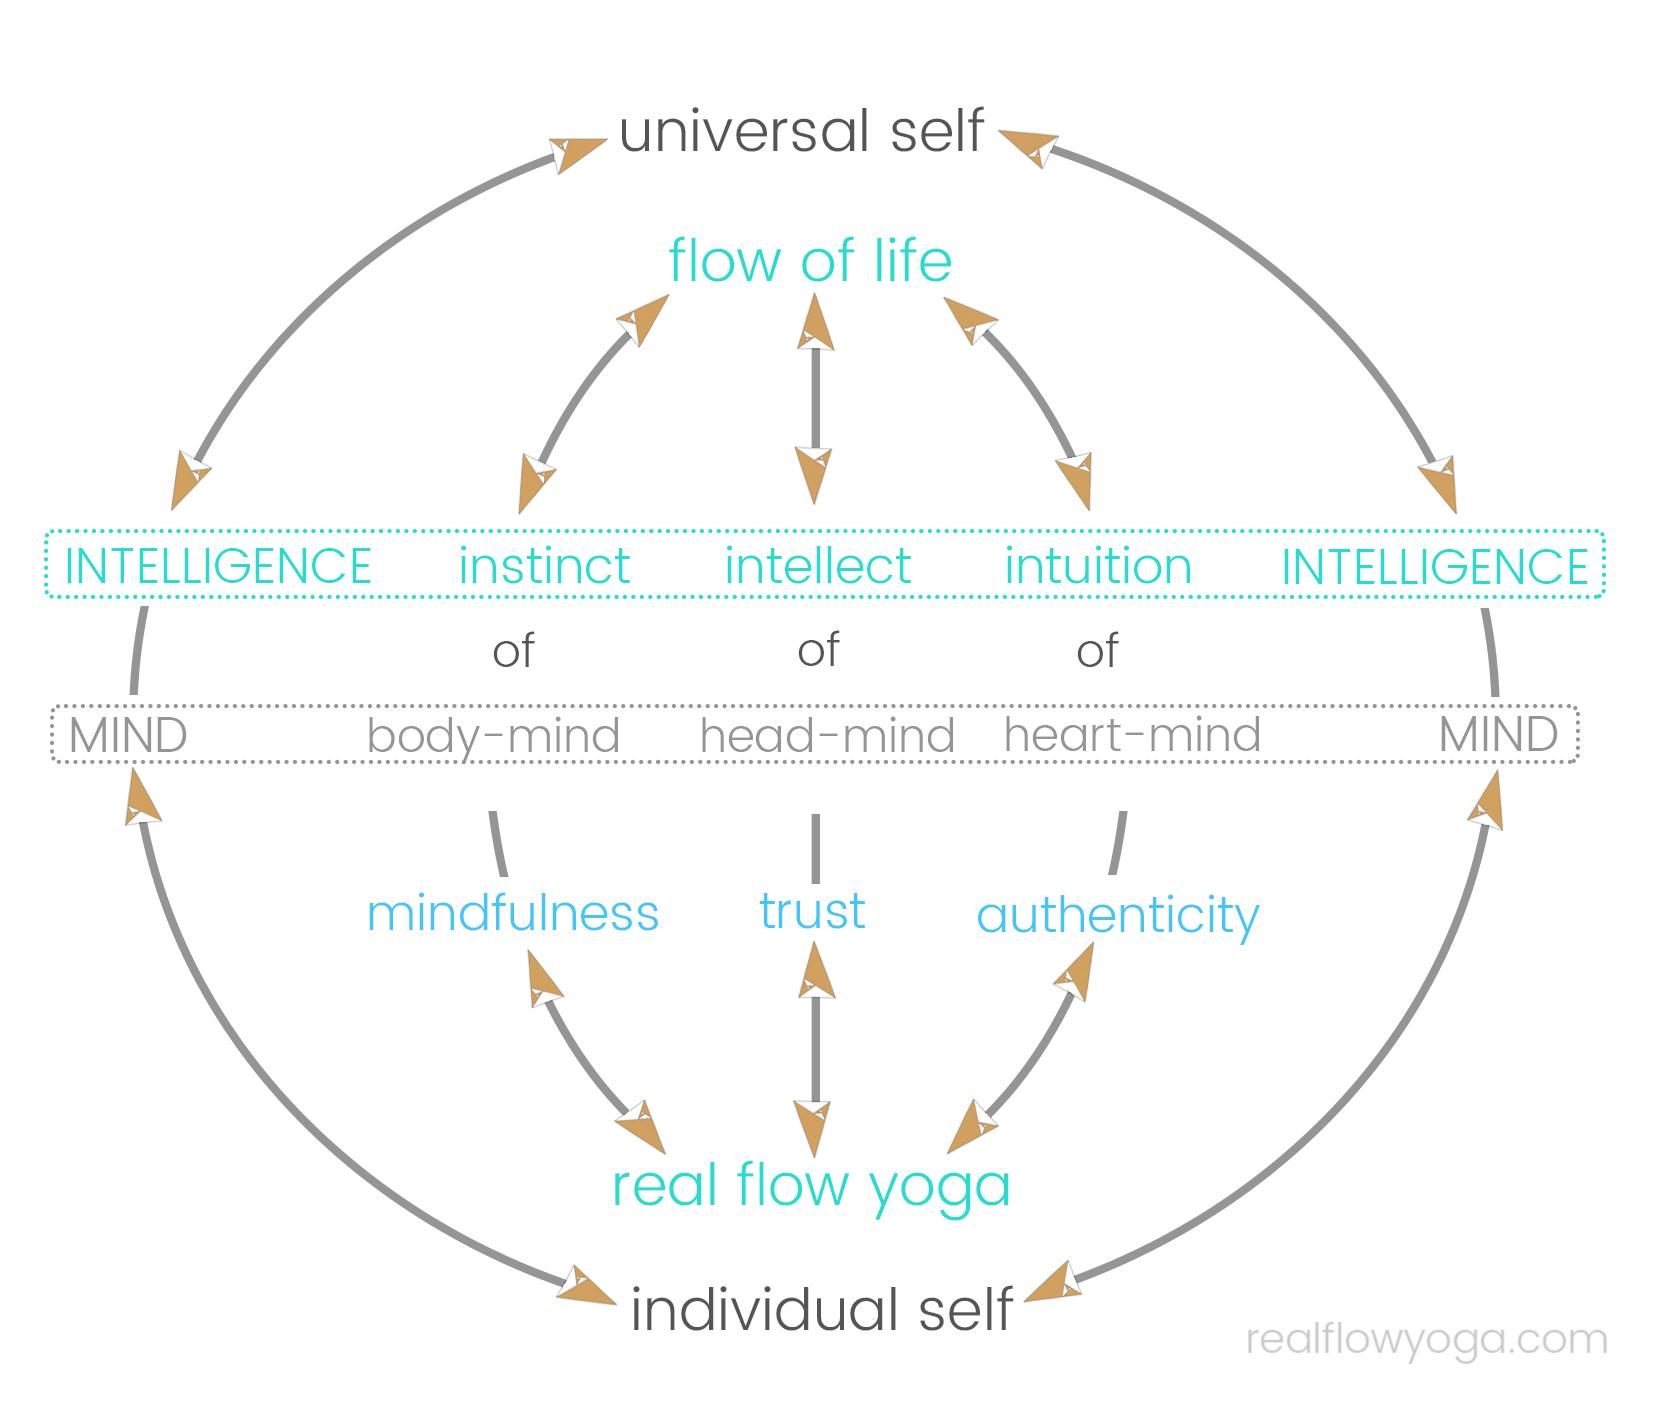 real flow yoga ethos